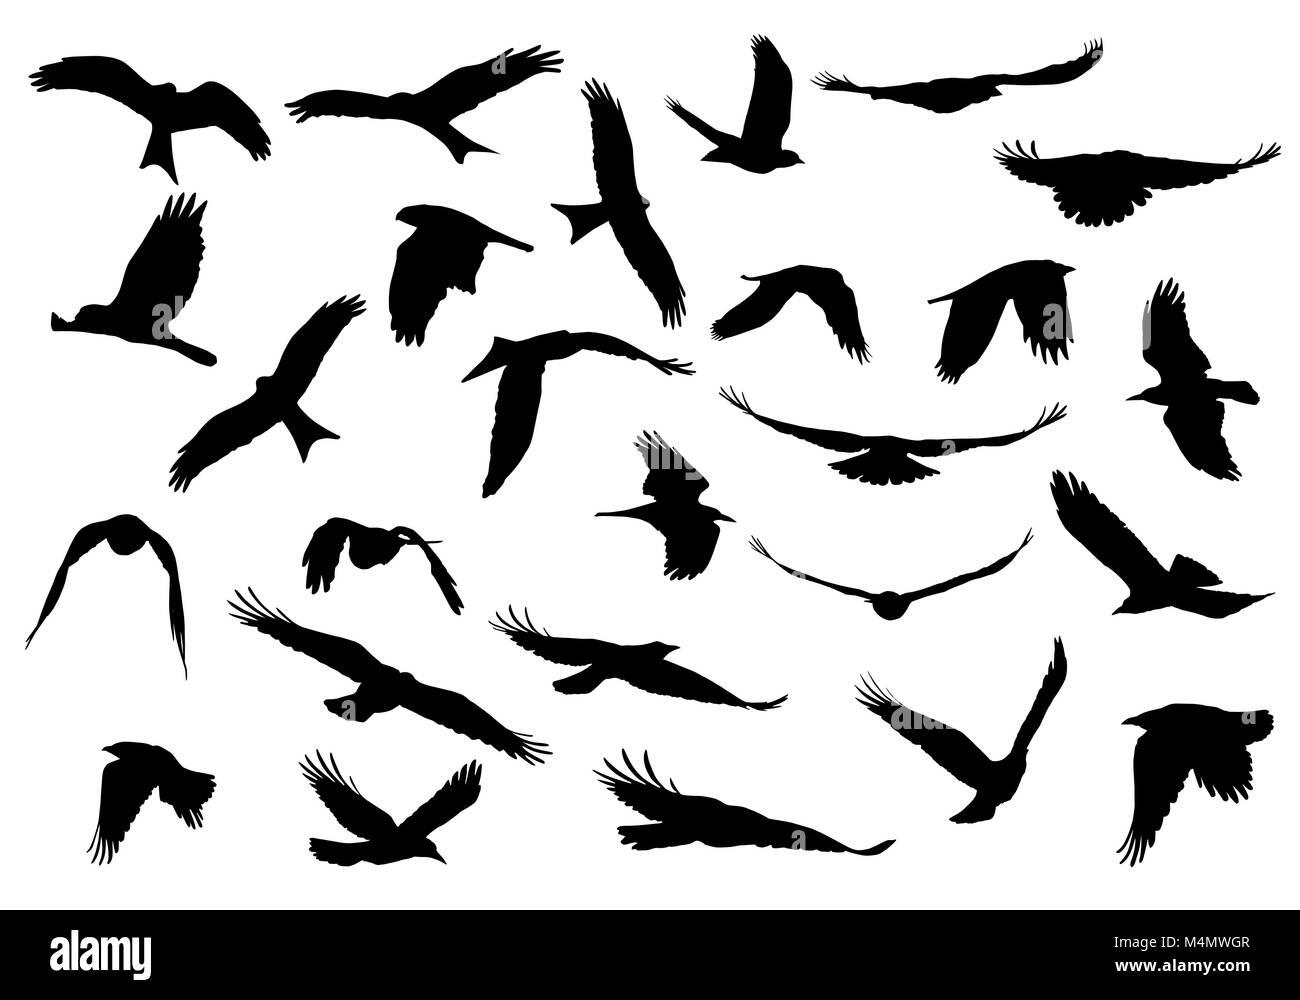 Www tattos www gmail com www fb com www livescores com www fb com simplephotos gallery view original image french minister visits cuba p www suryasixpackbody com copy atharva six pack valid www www suryasixpackbody com thecheapjerseys Images